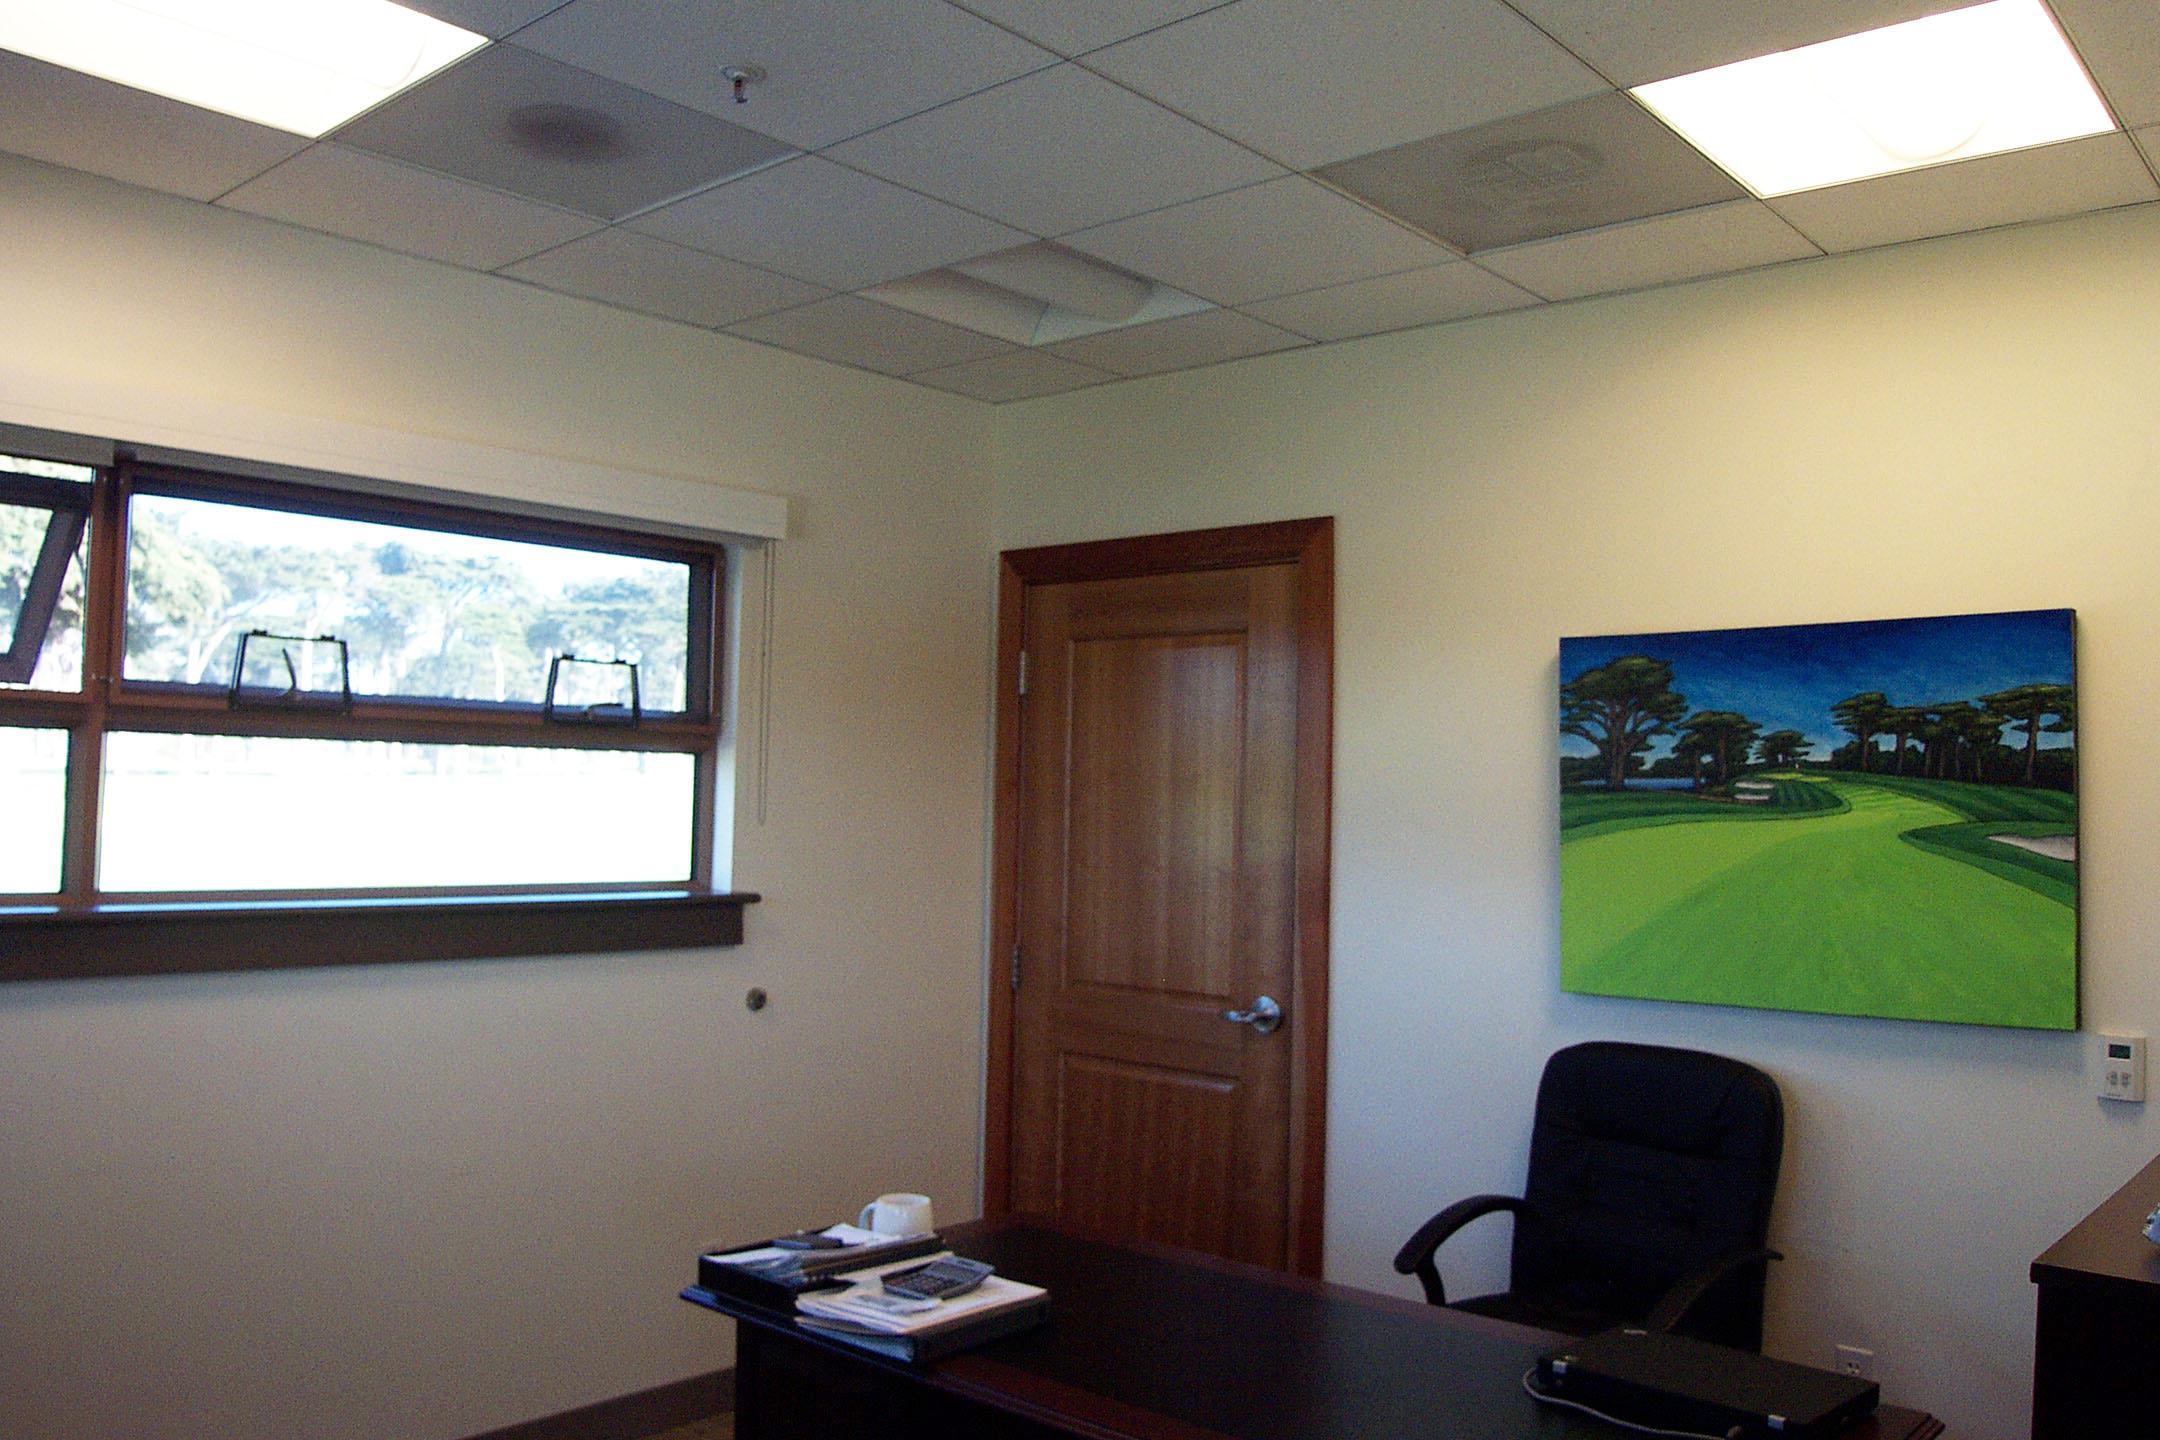 TPC Harding Park Director's Office